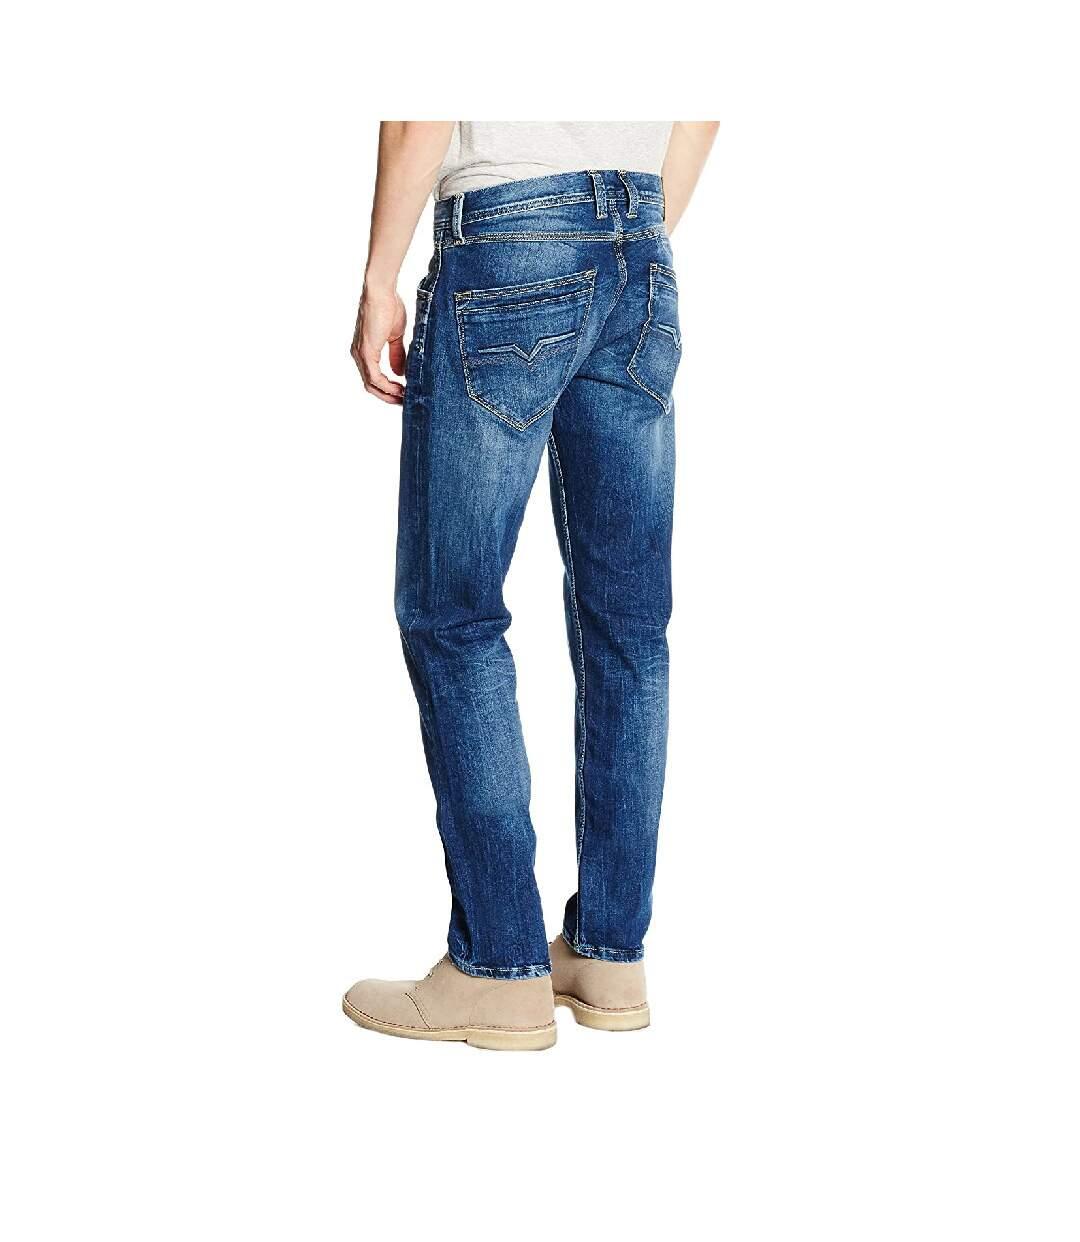 Jeans Regular Bleu Foncé Homme Pepe Jeans Spike